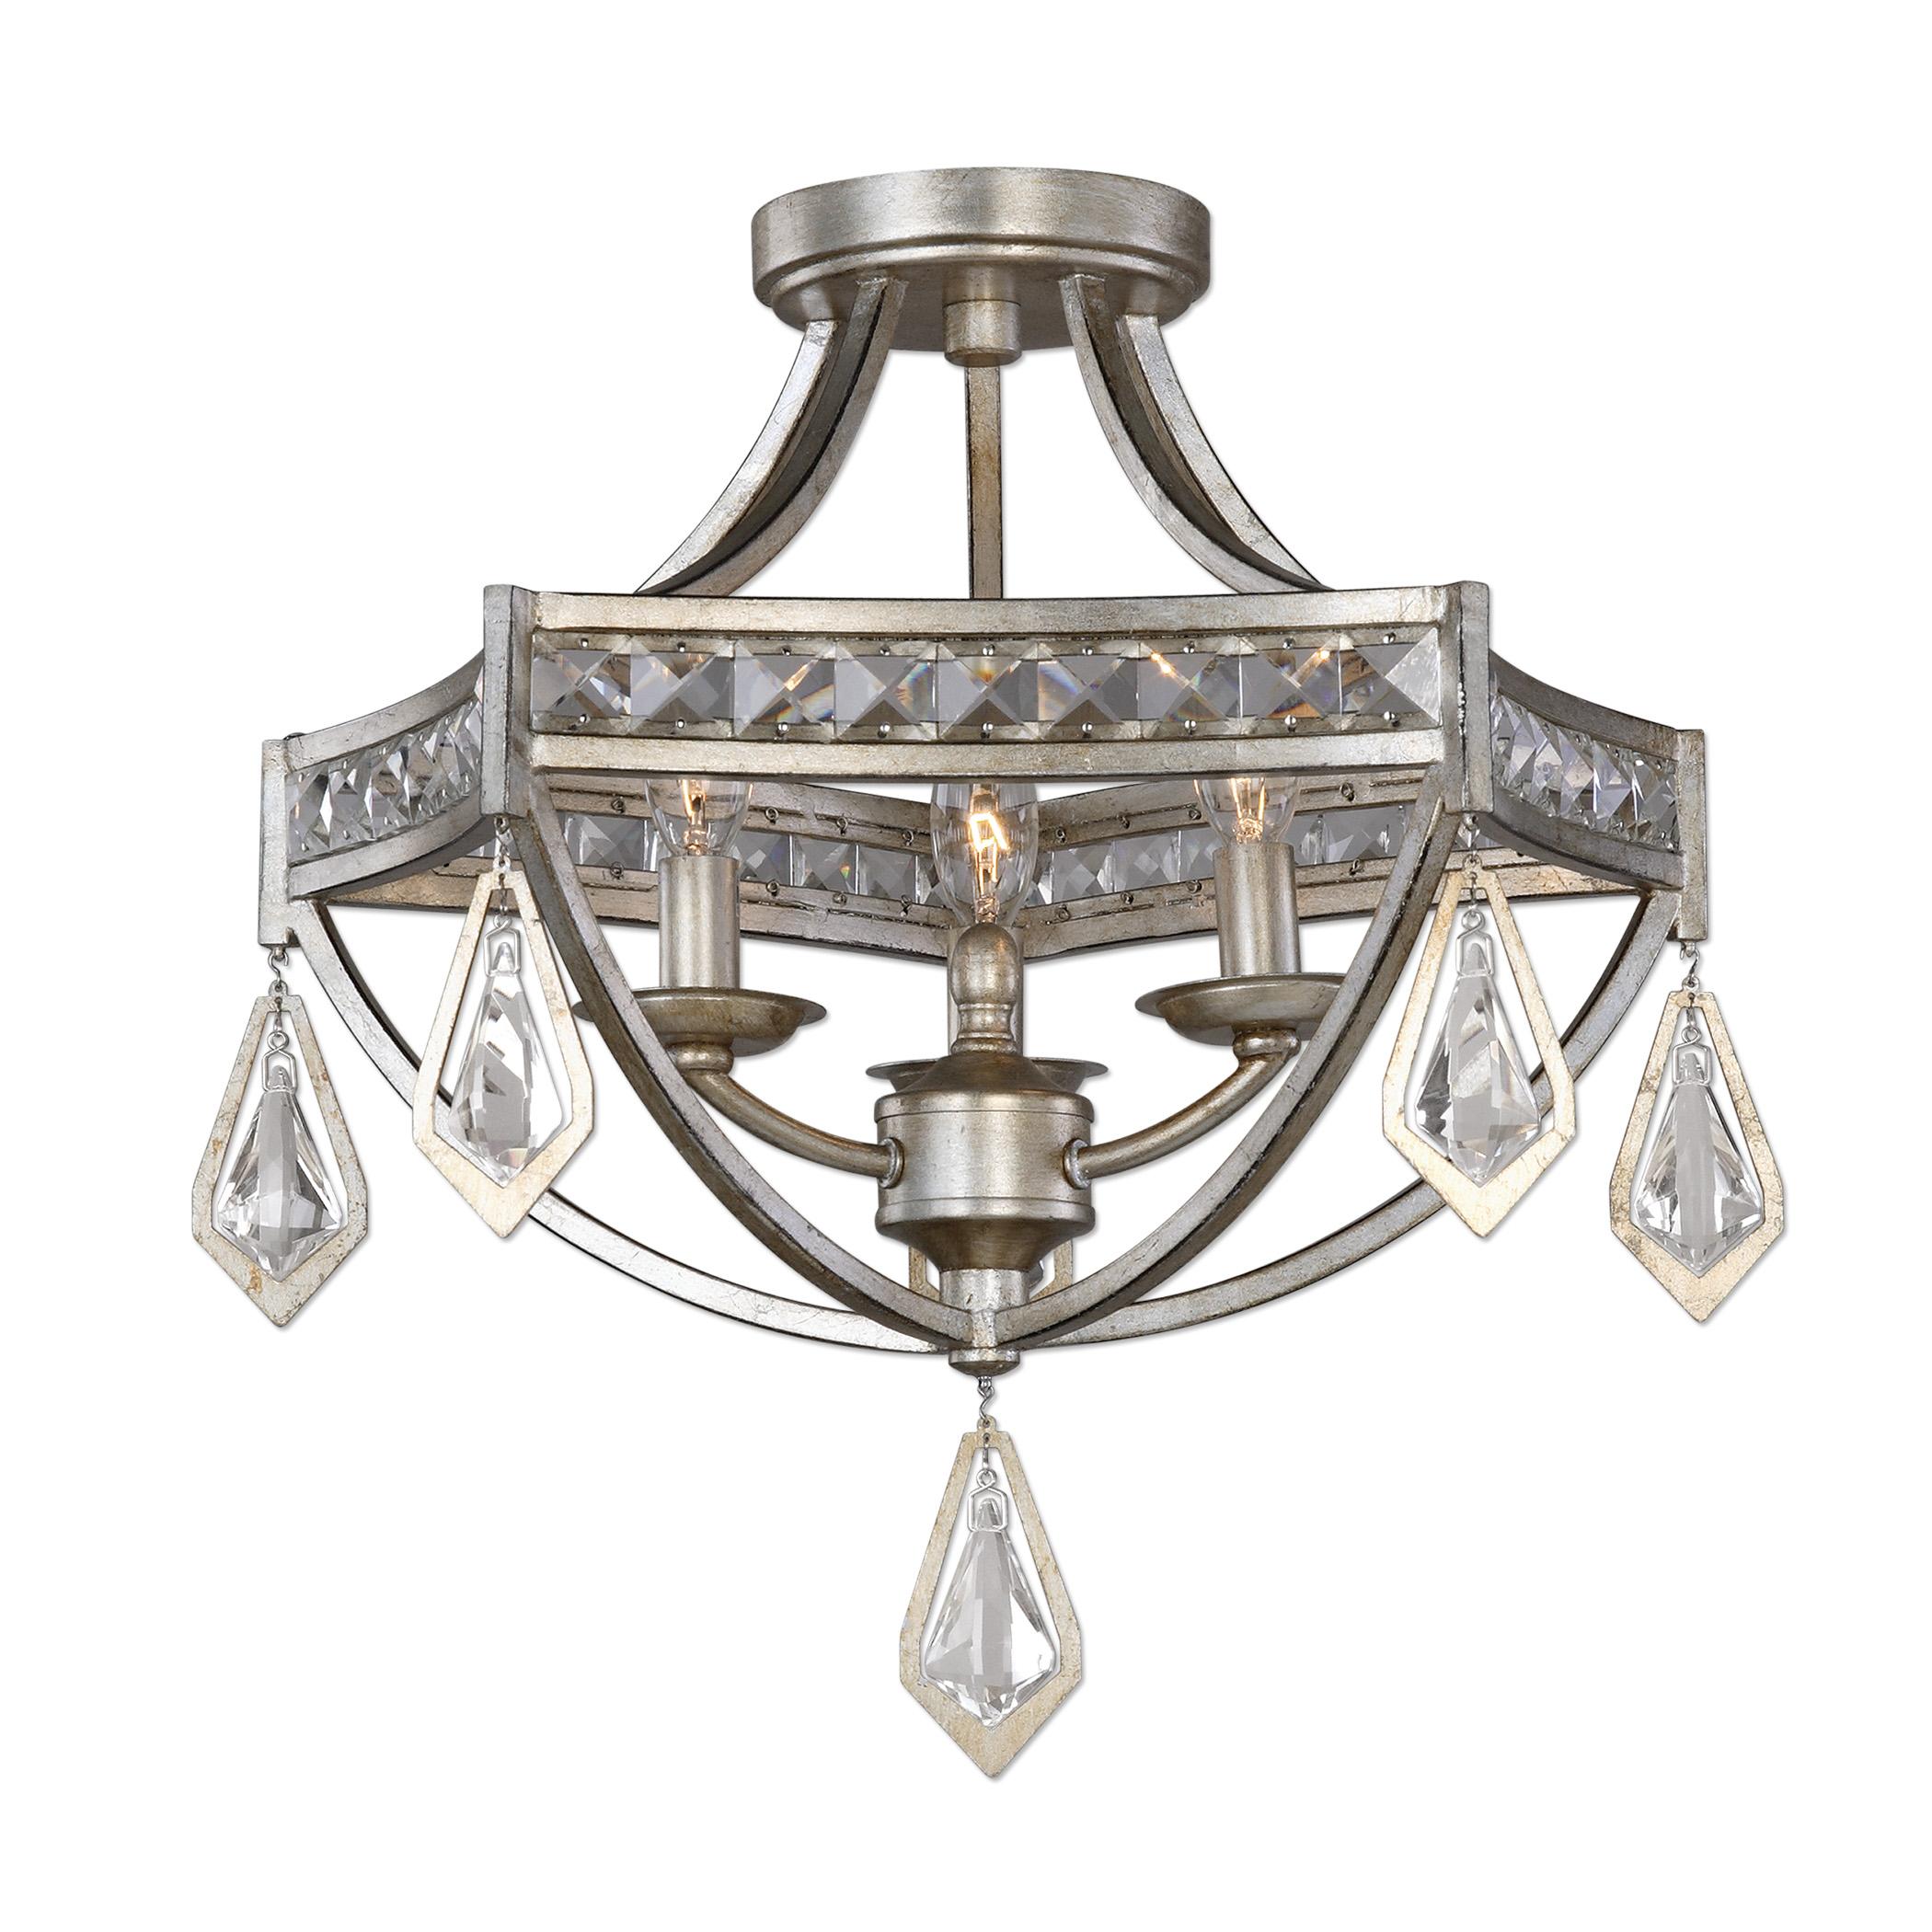 Lighting Fixtures - Pendant Lights Tamworth Modern 3 Light Semi Flush by Uttermost at Mueller Furniture